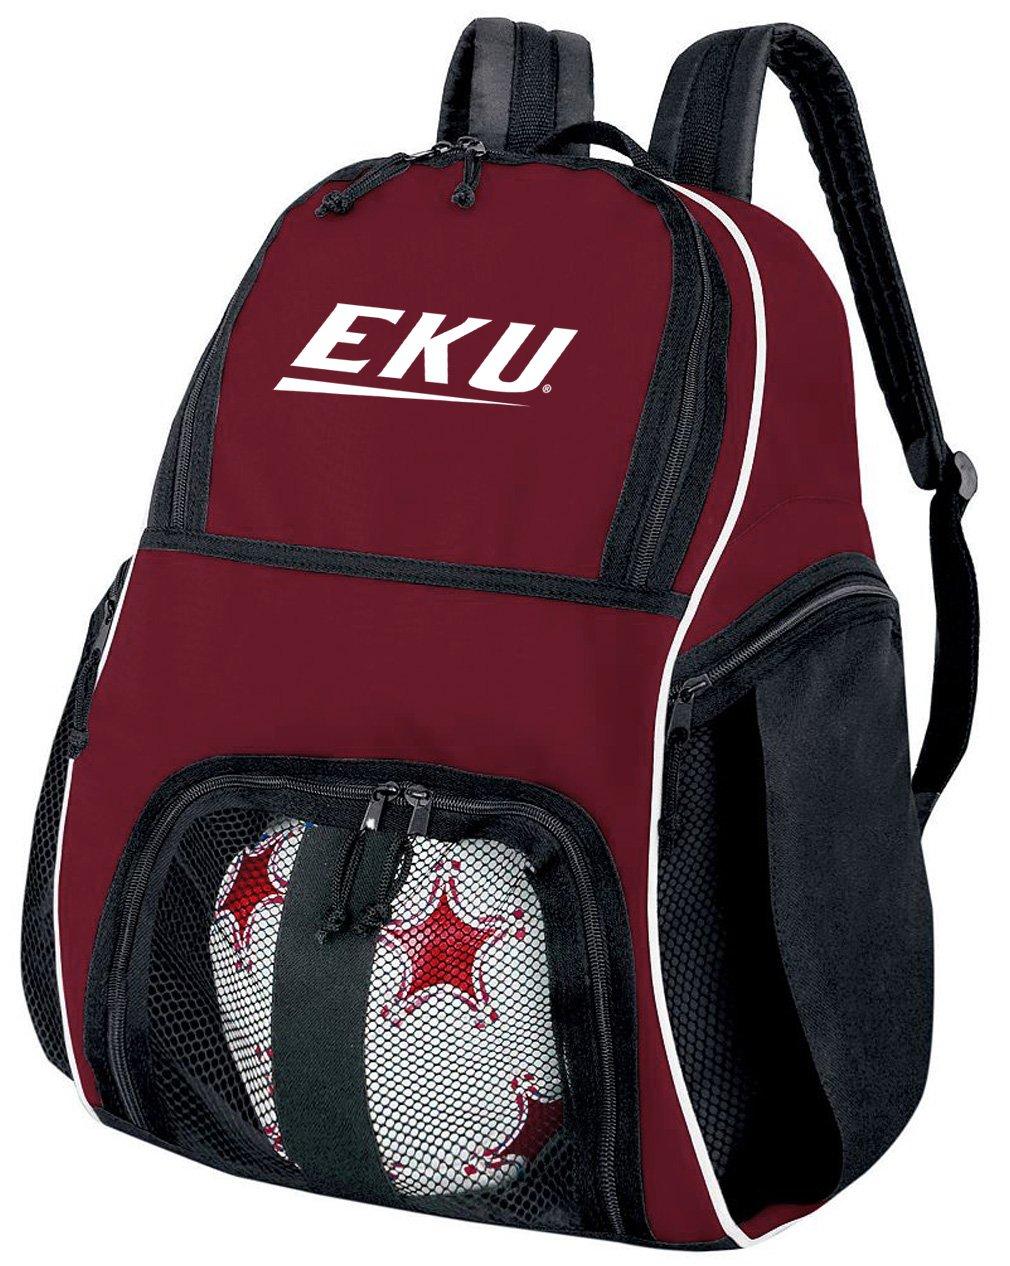 EKUサッカーバックパックまたはEastern Kentucky Universityバレーボールバッグマルーン   B07FDMH7X4